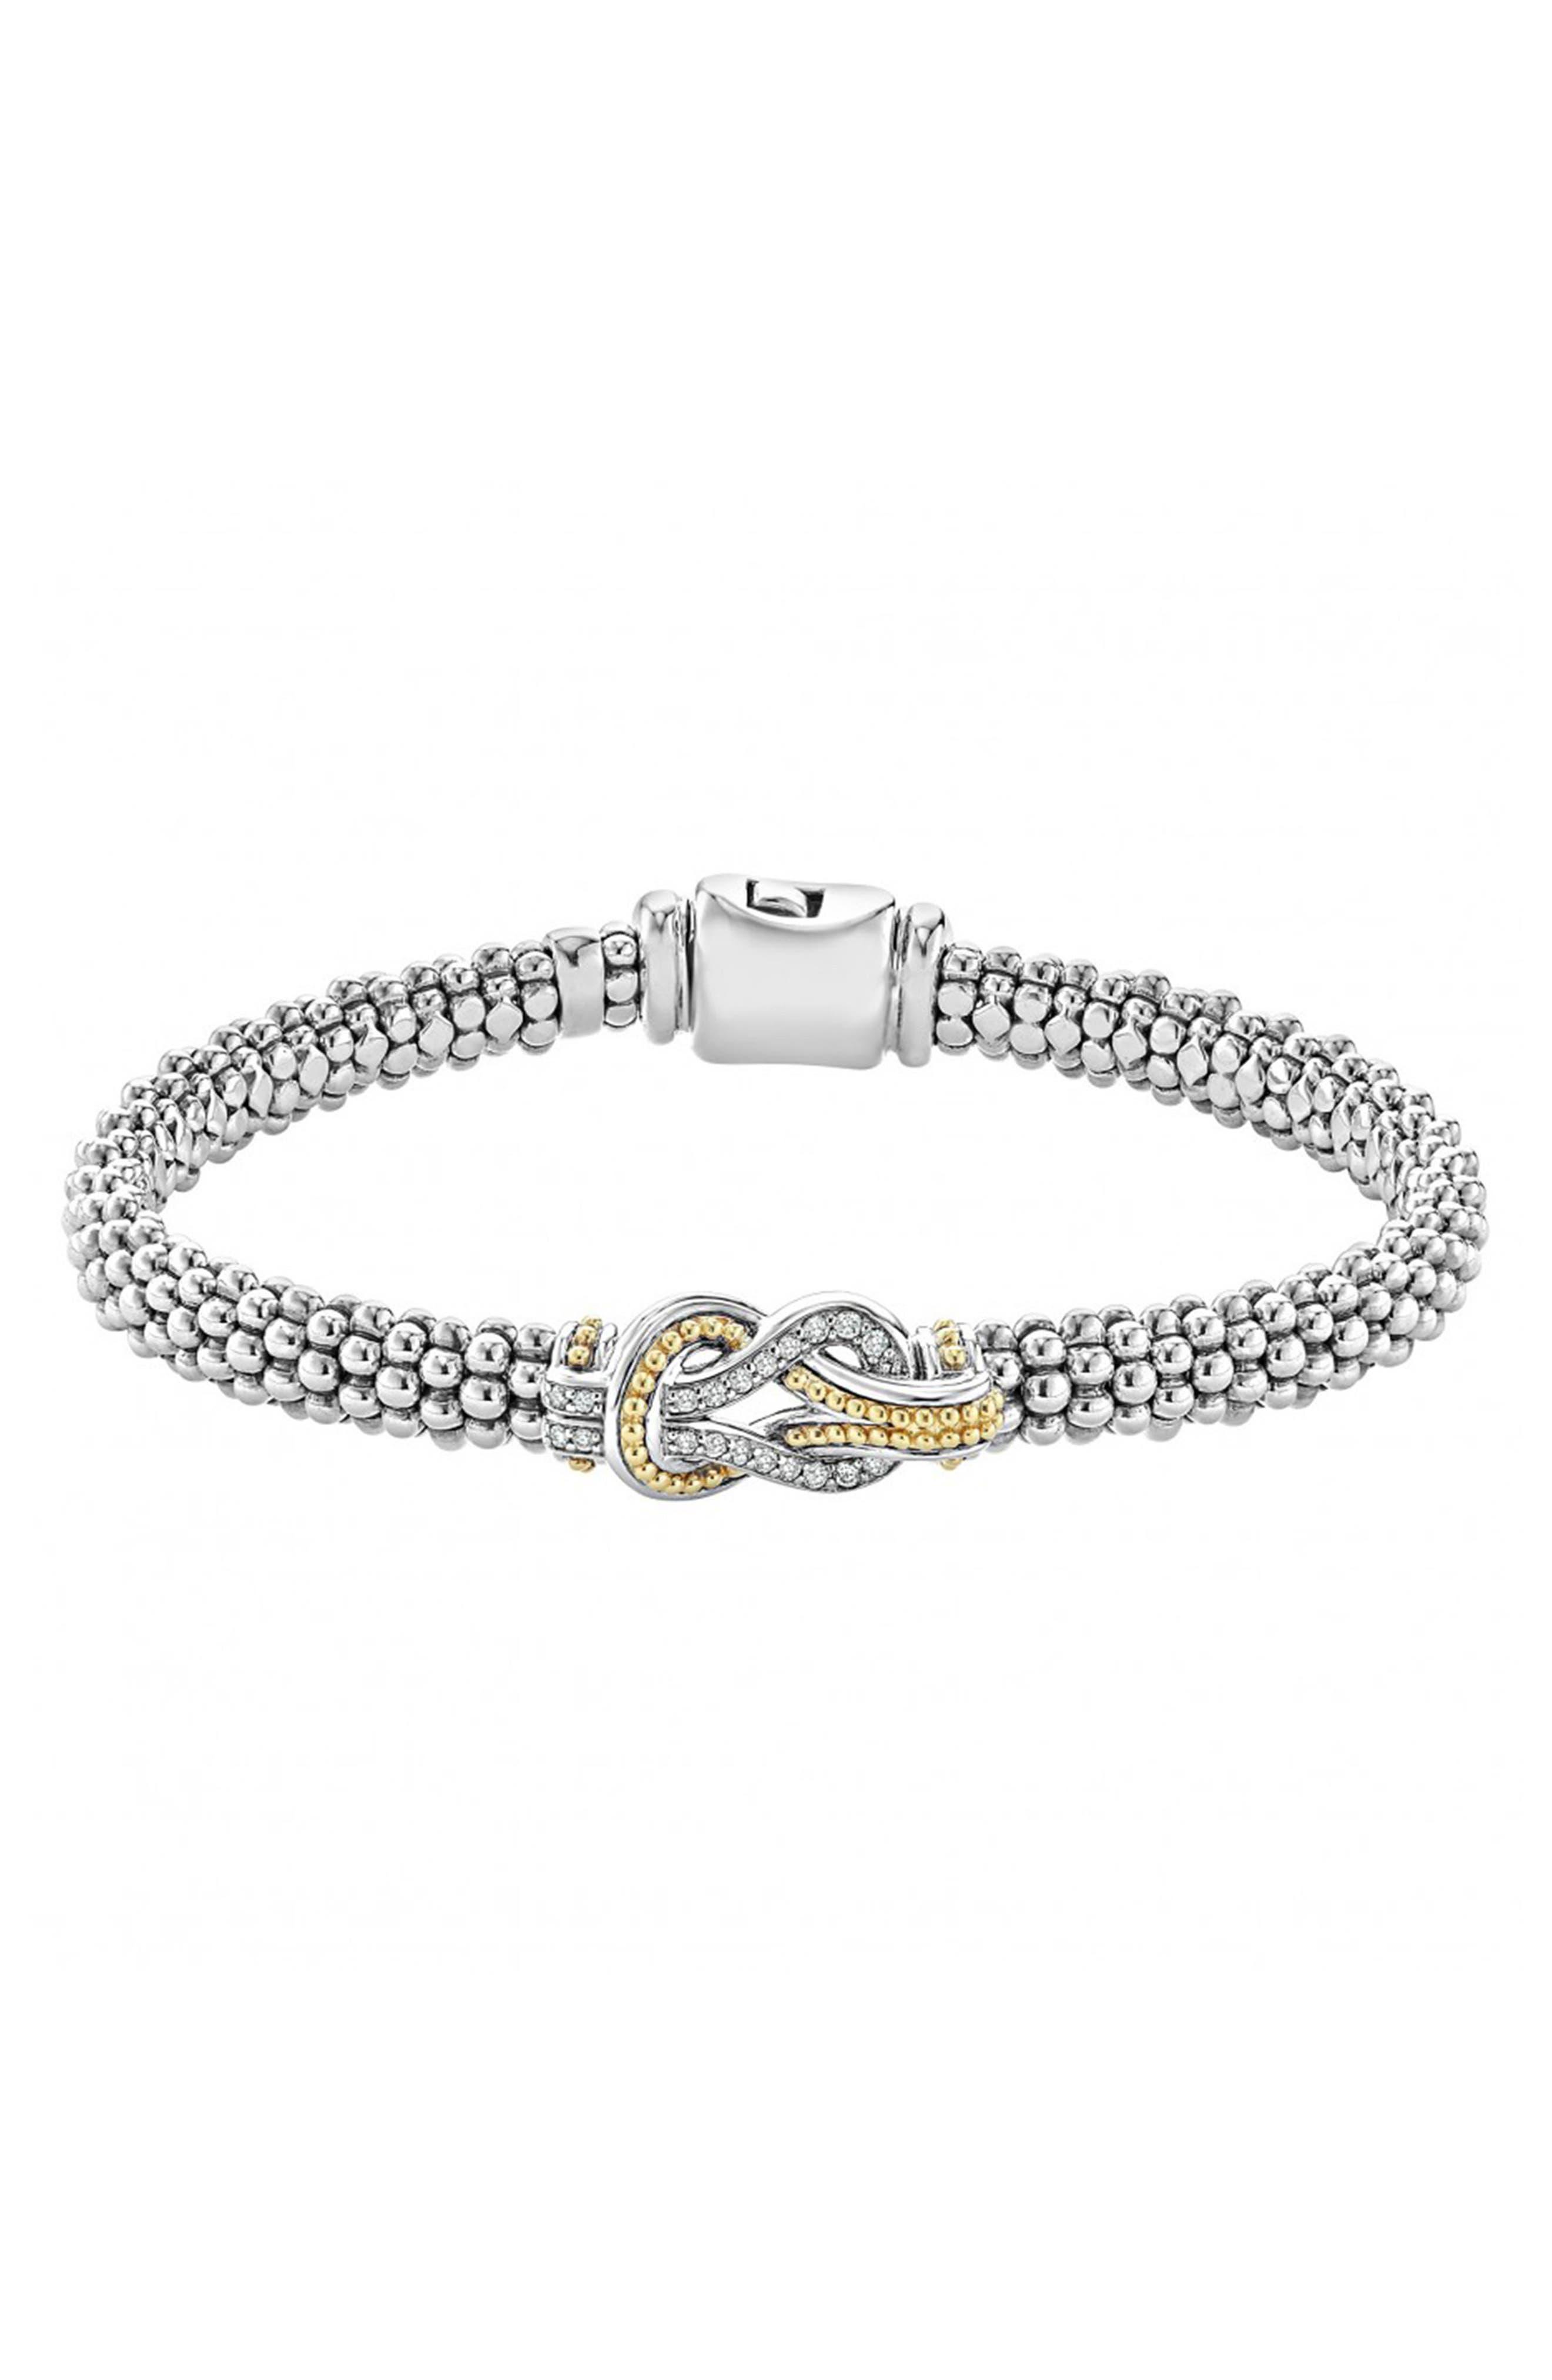 'Newport' Diamond Knot Bracelet,                         Main,                         color, SILVER/ GOLD